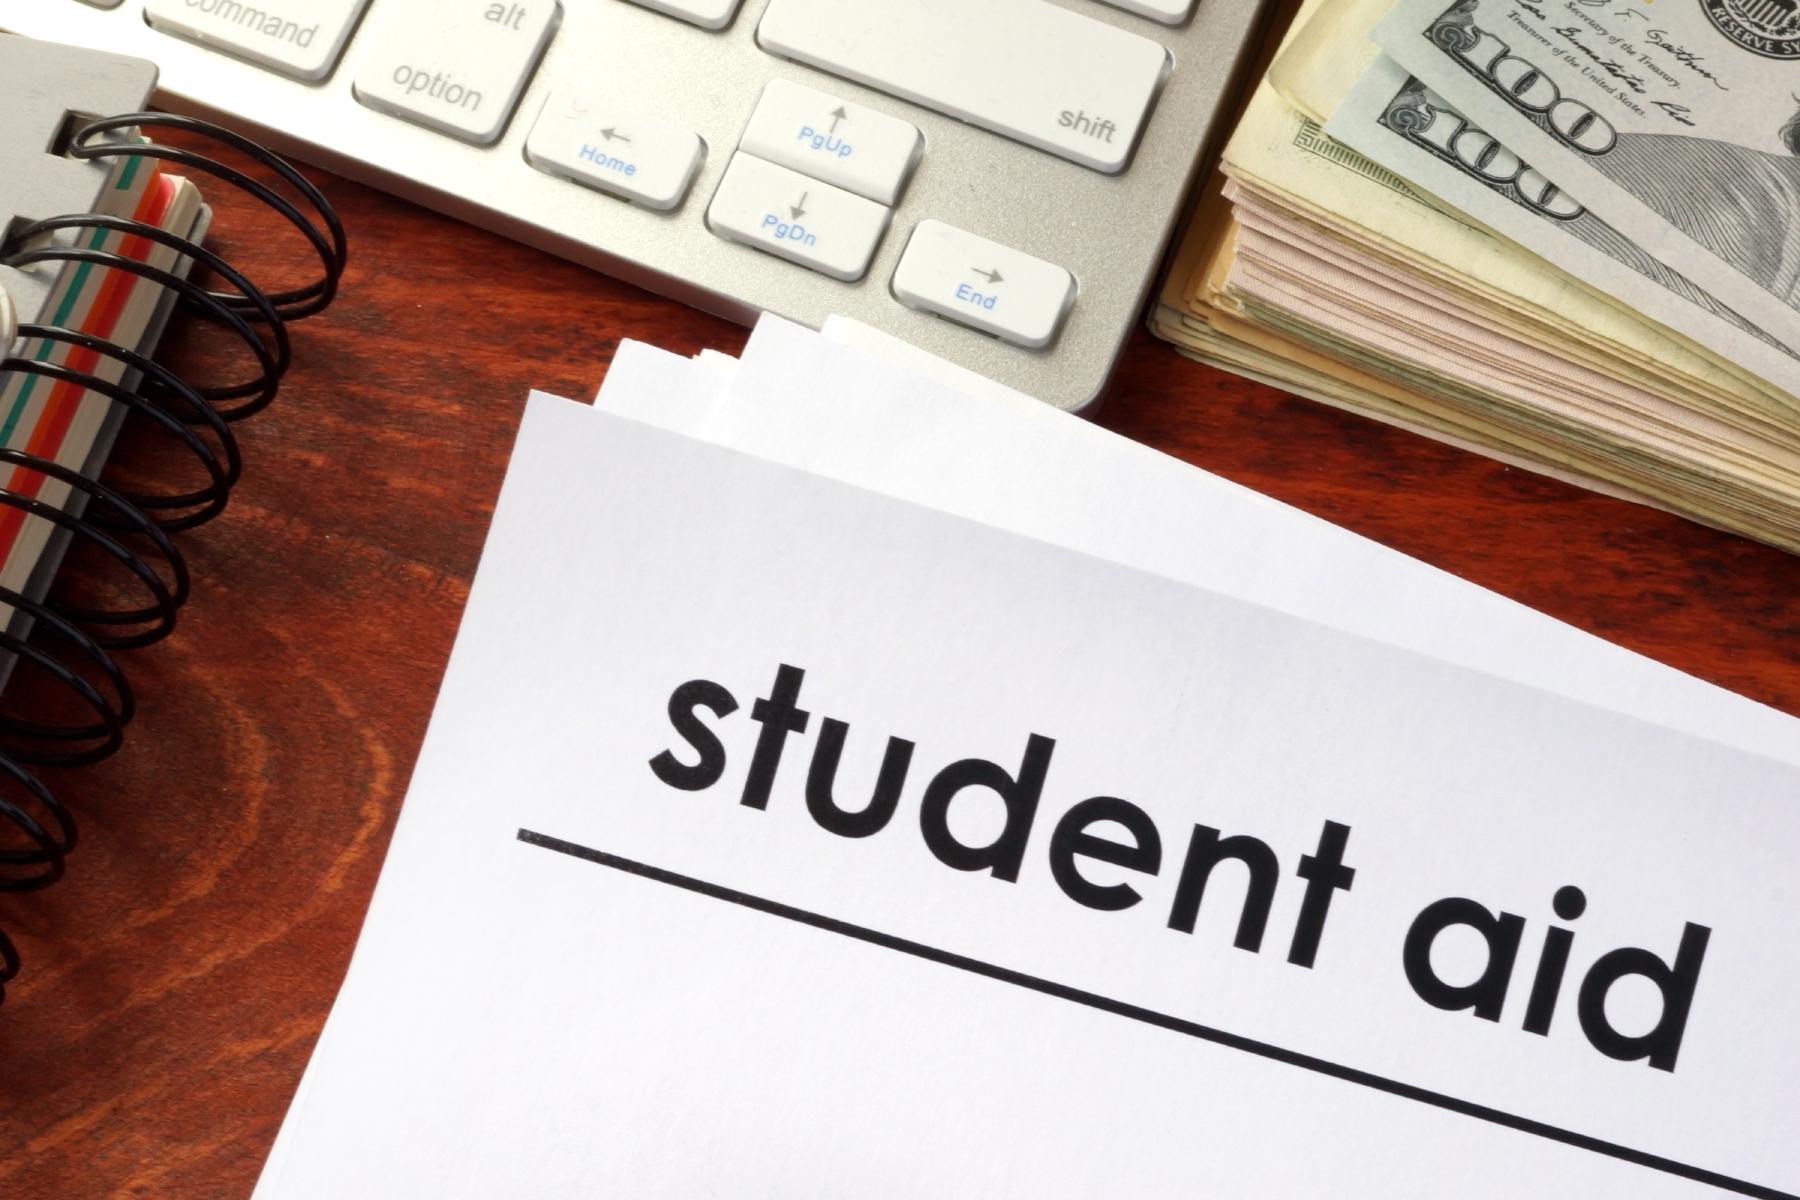 student-aid-college-money-1800-12-apr-2017.jpg